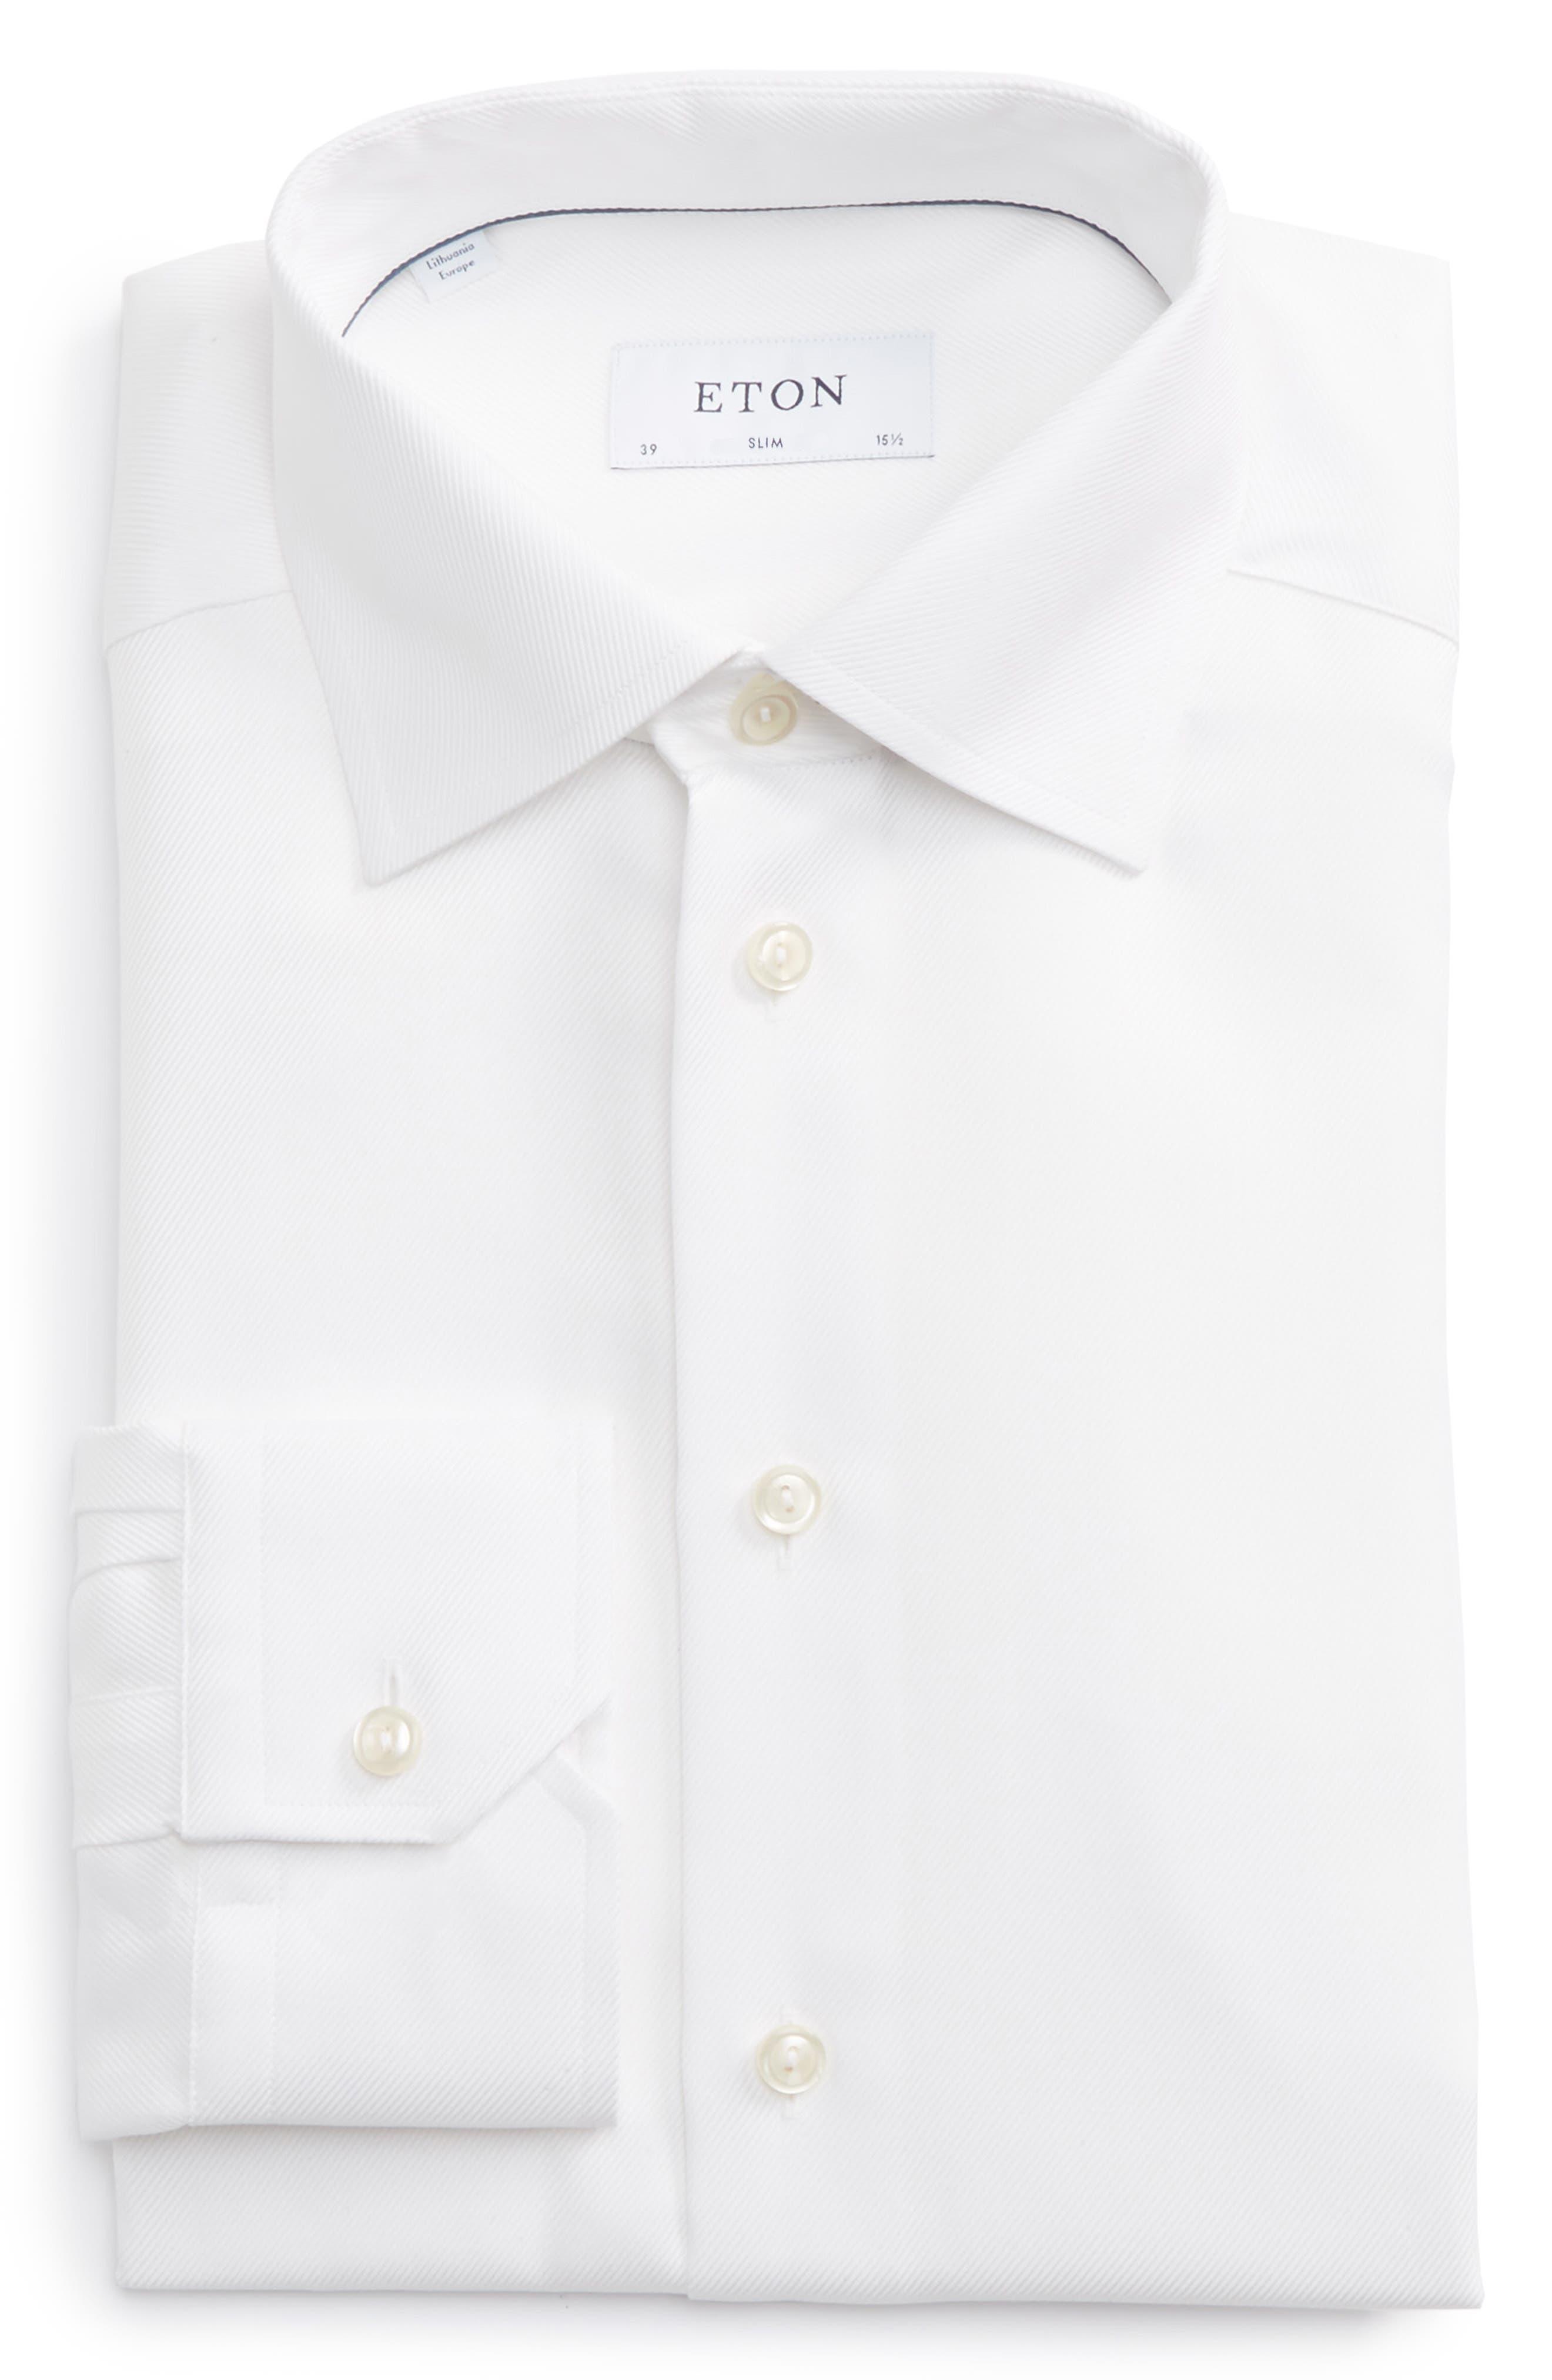 Main Image - Eton Slim Fit Cavalry Twill Dress Shirt